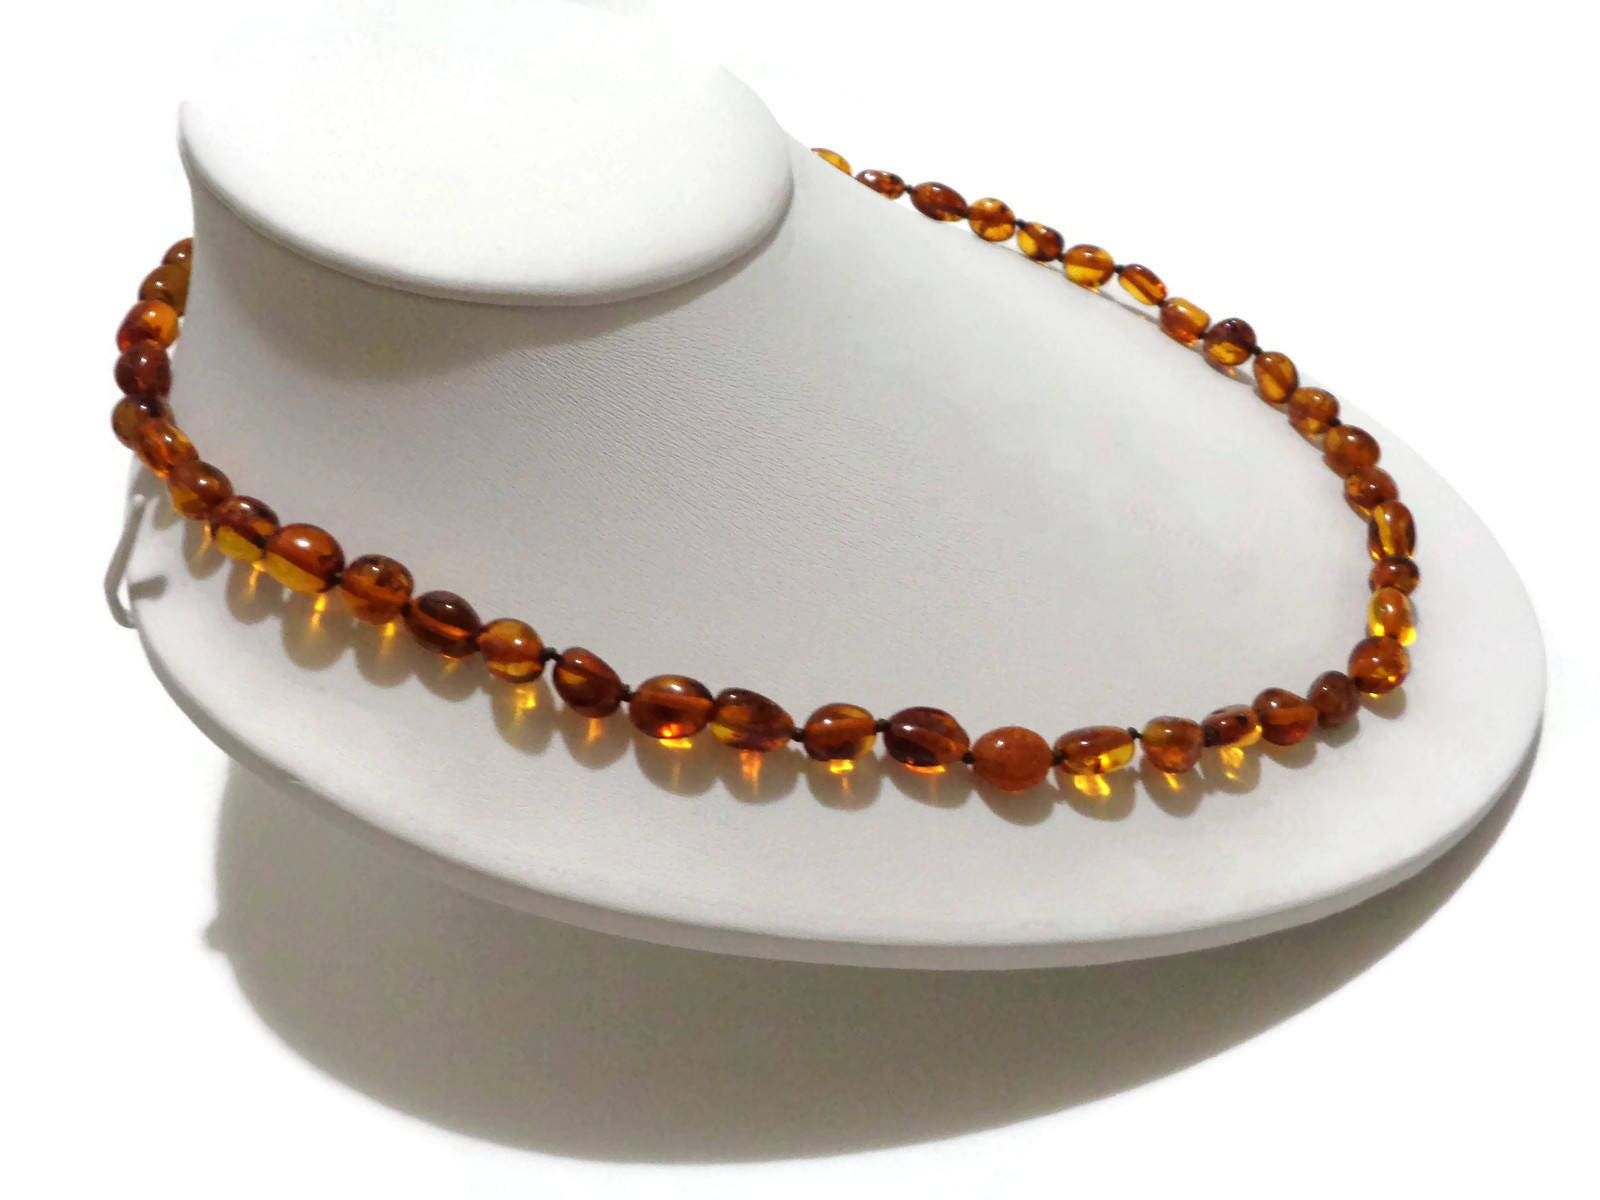 100% Natural & Handmade Amber Beads Jewelry haFyhrjqd